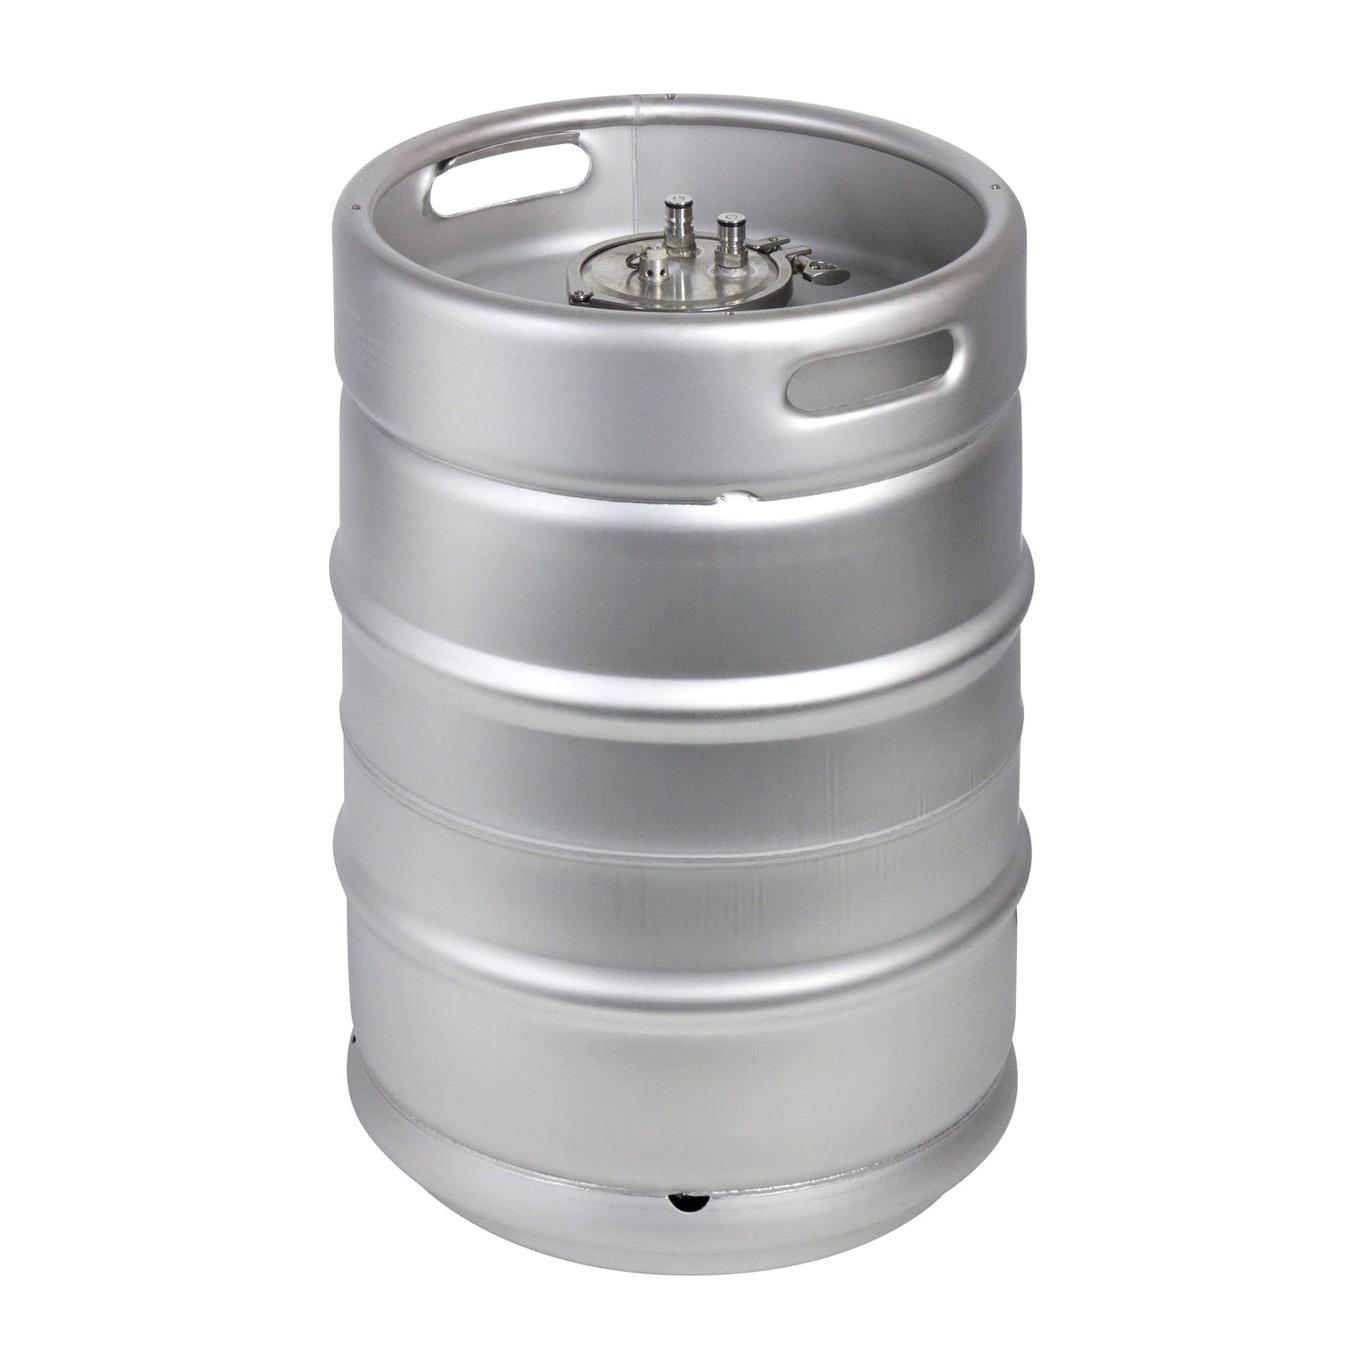 Corona Extra Beer Keg